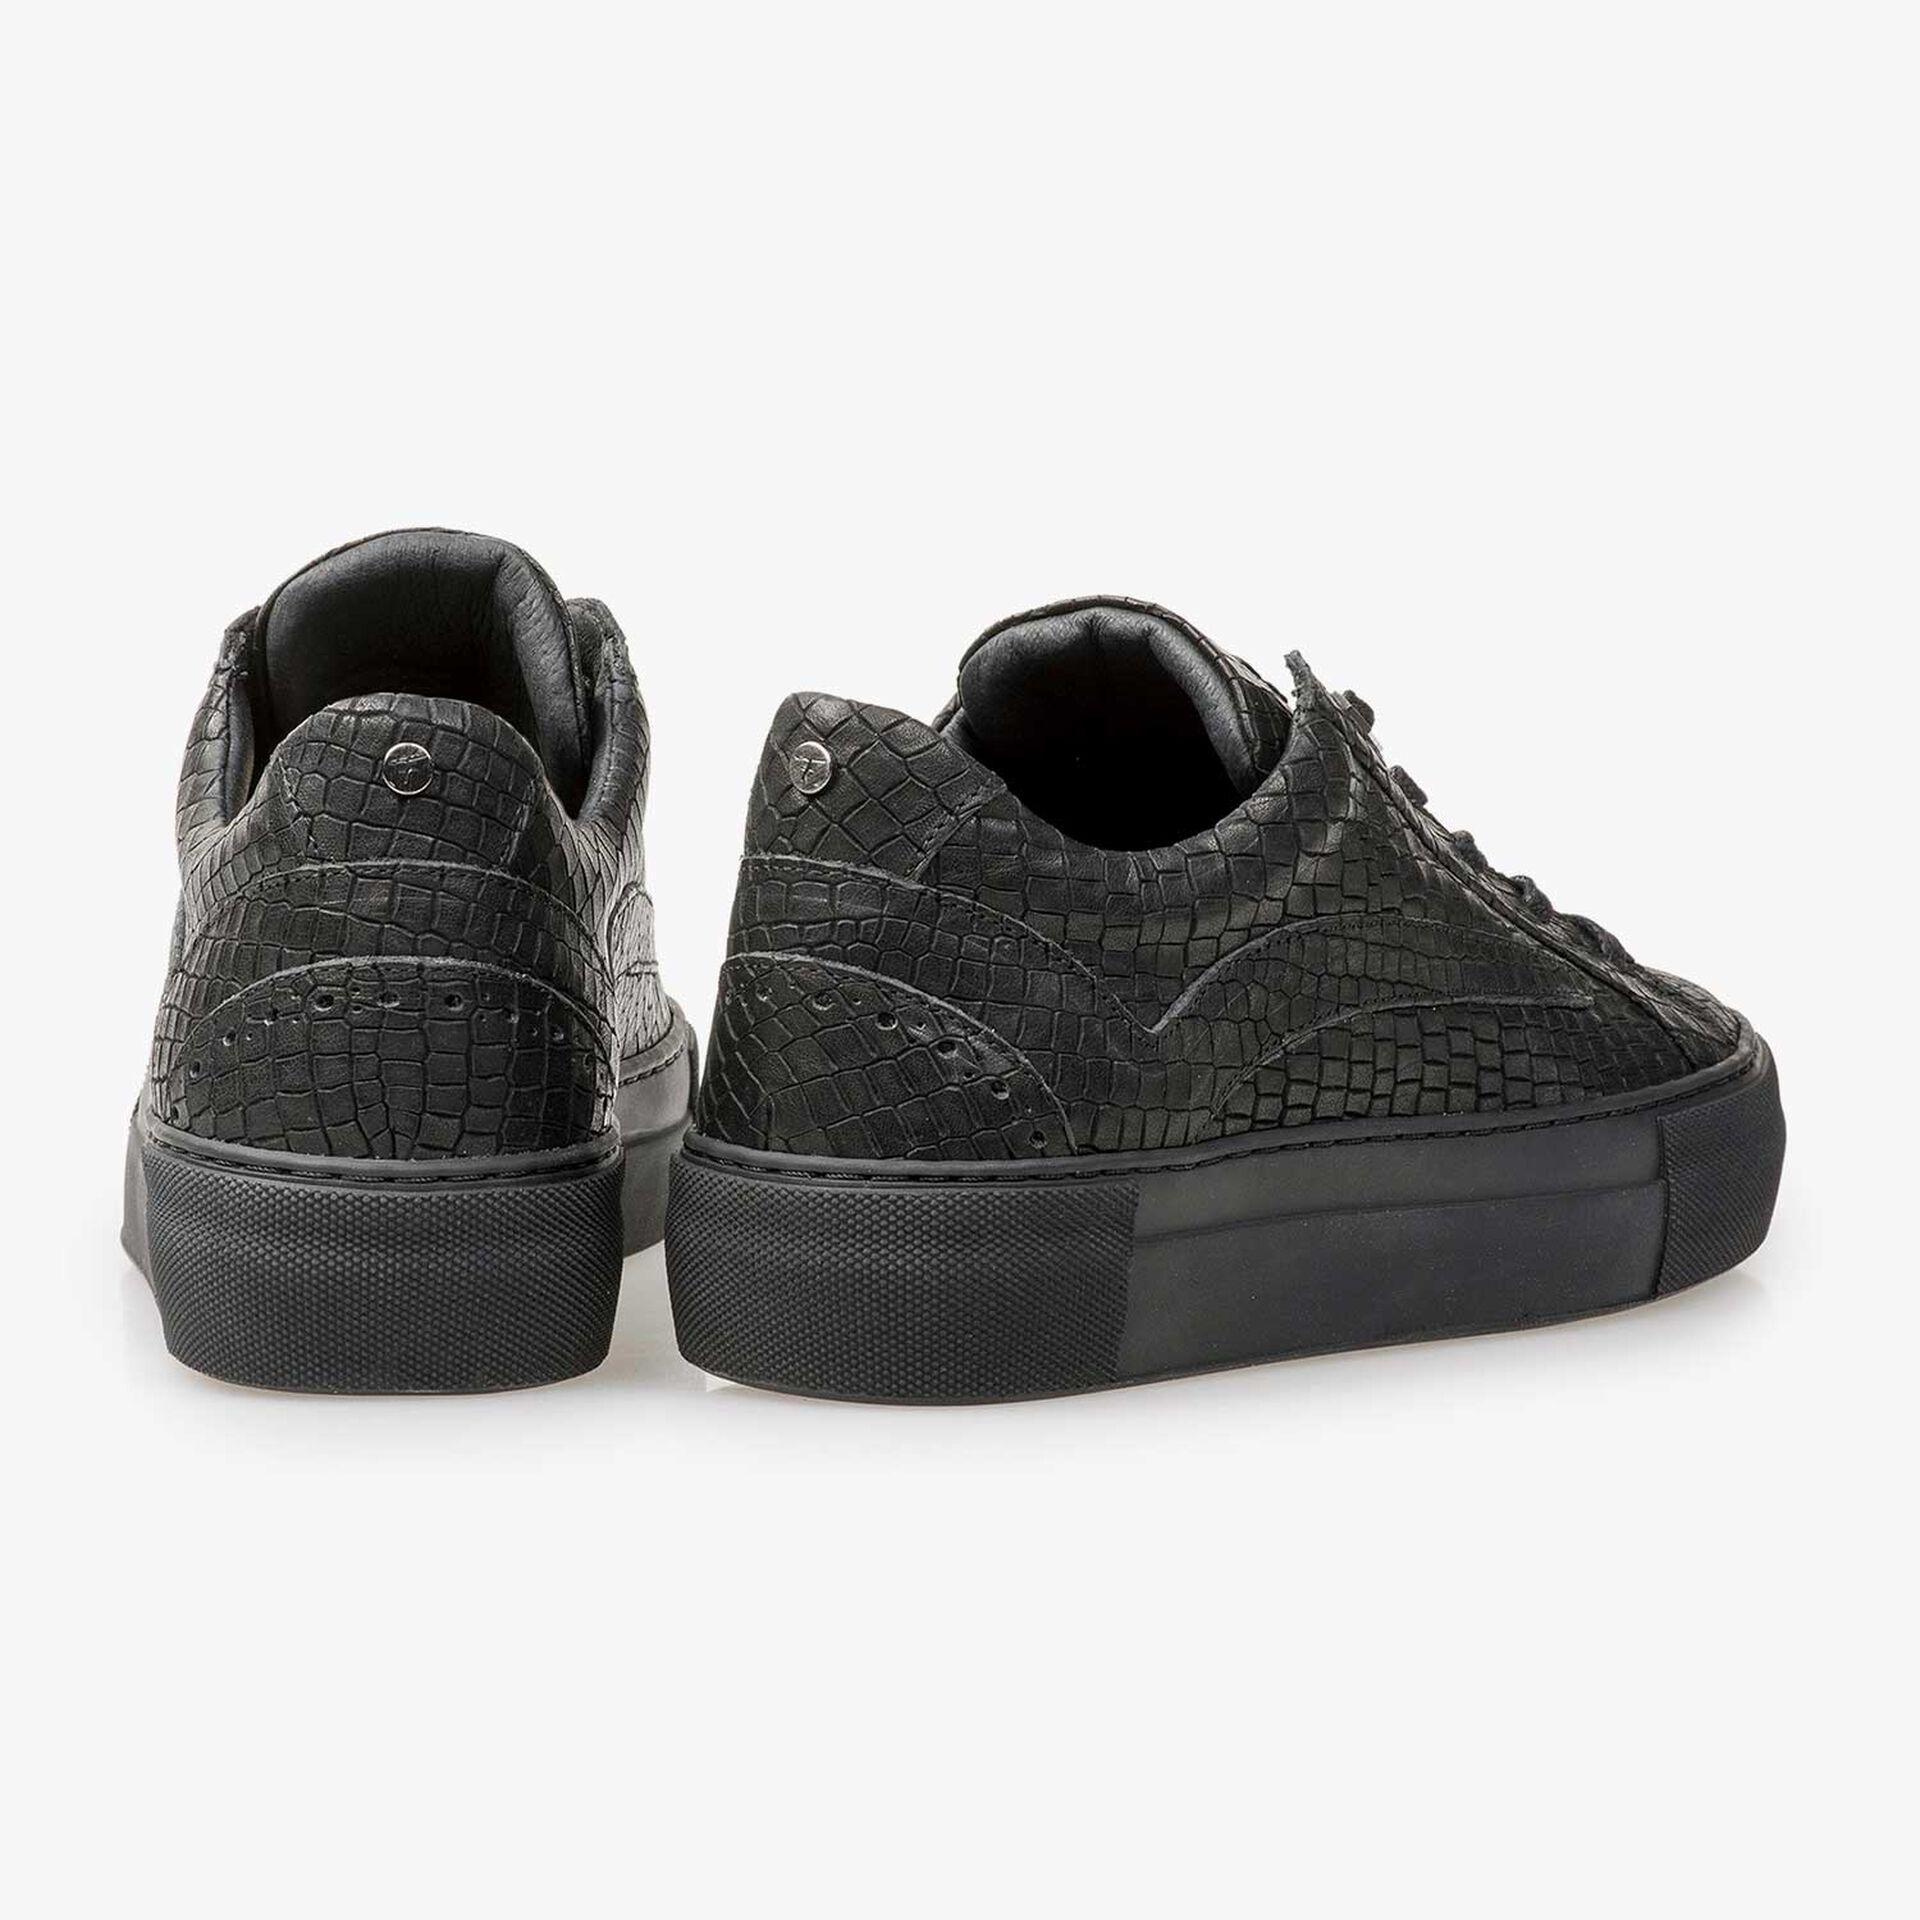 Schwarzer Leder-Sneaker mit Krokoprint